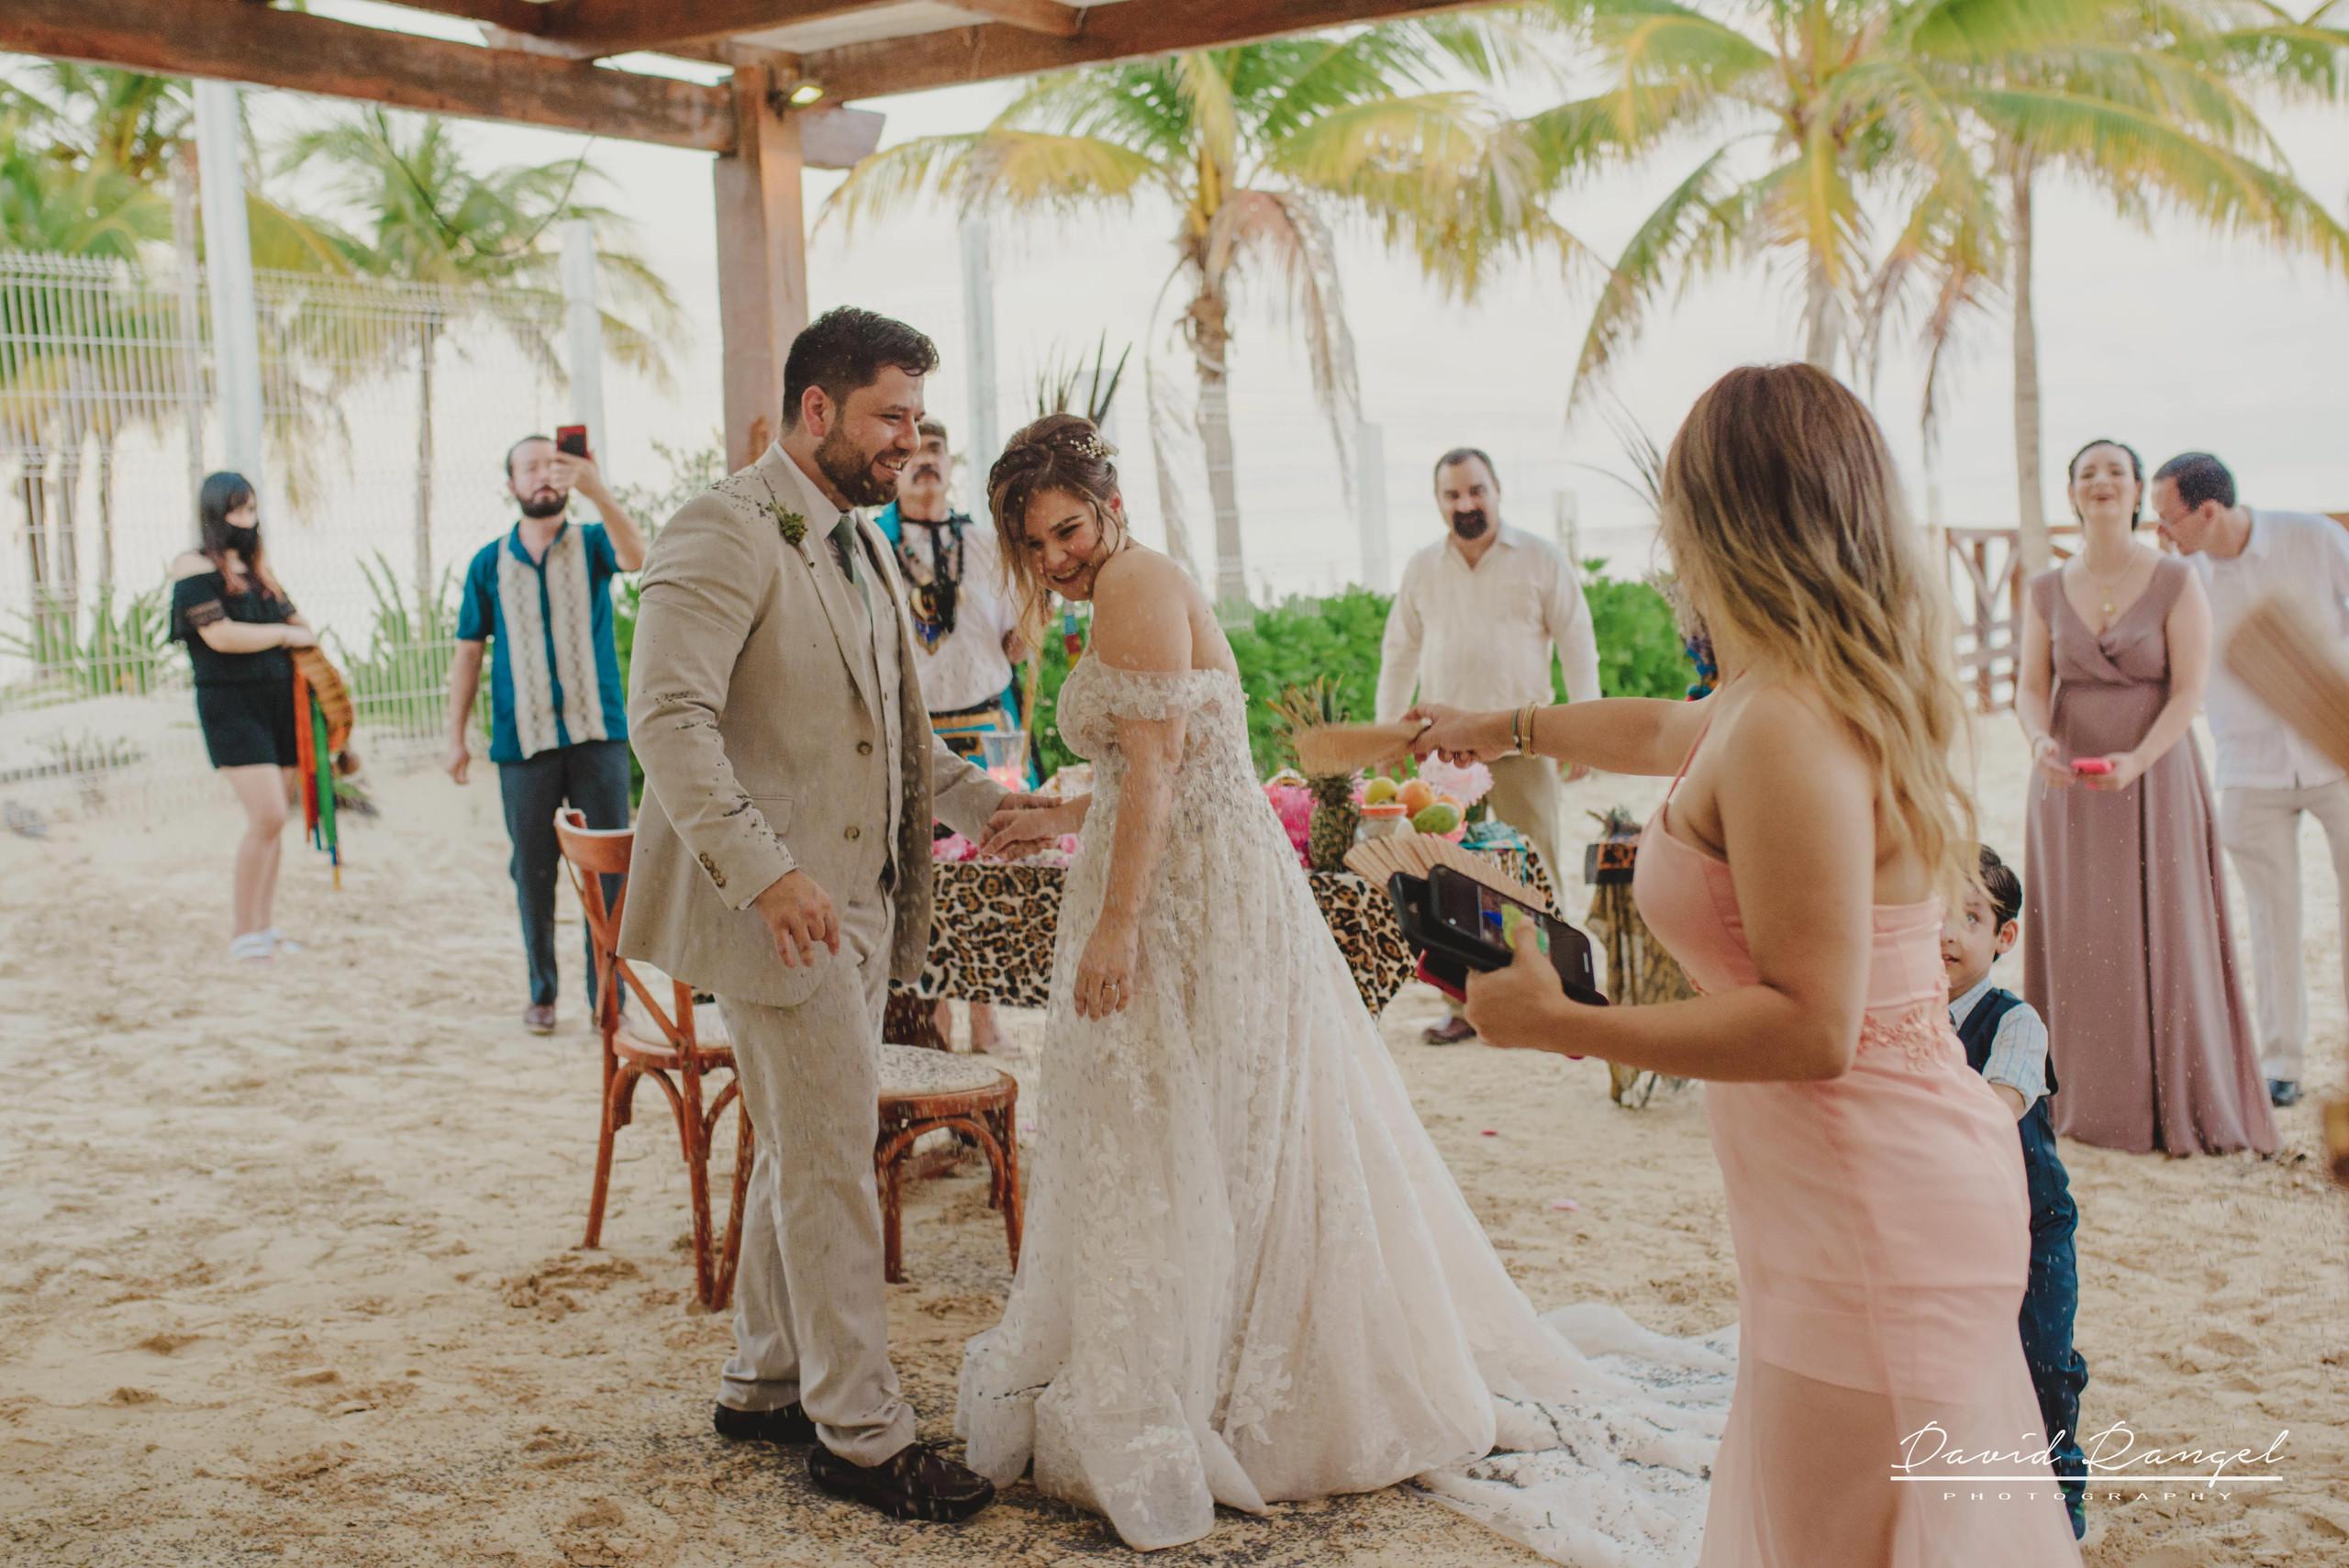 groom+bride+wedding+ceremony+dress+villa+chenera+isla+blanca+costa+mujeres+garden+beach+chaman+traditional+mayan+wedding+gazebo+celebration+photo+happy+photographer+in+cancun